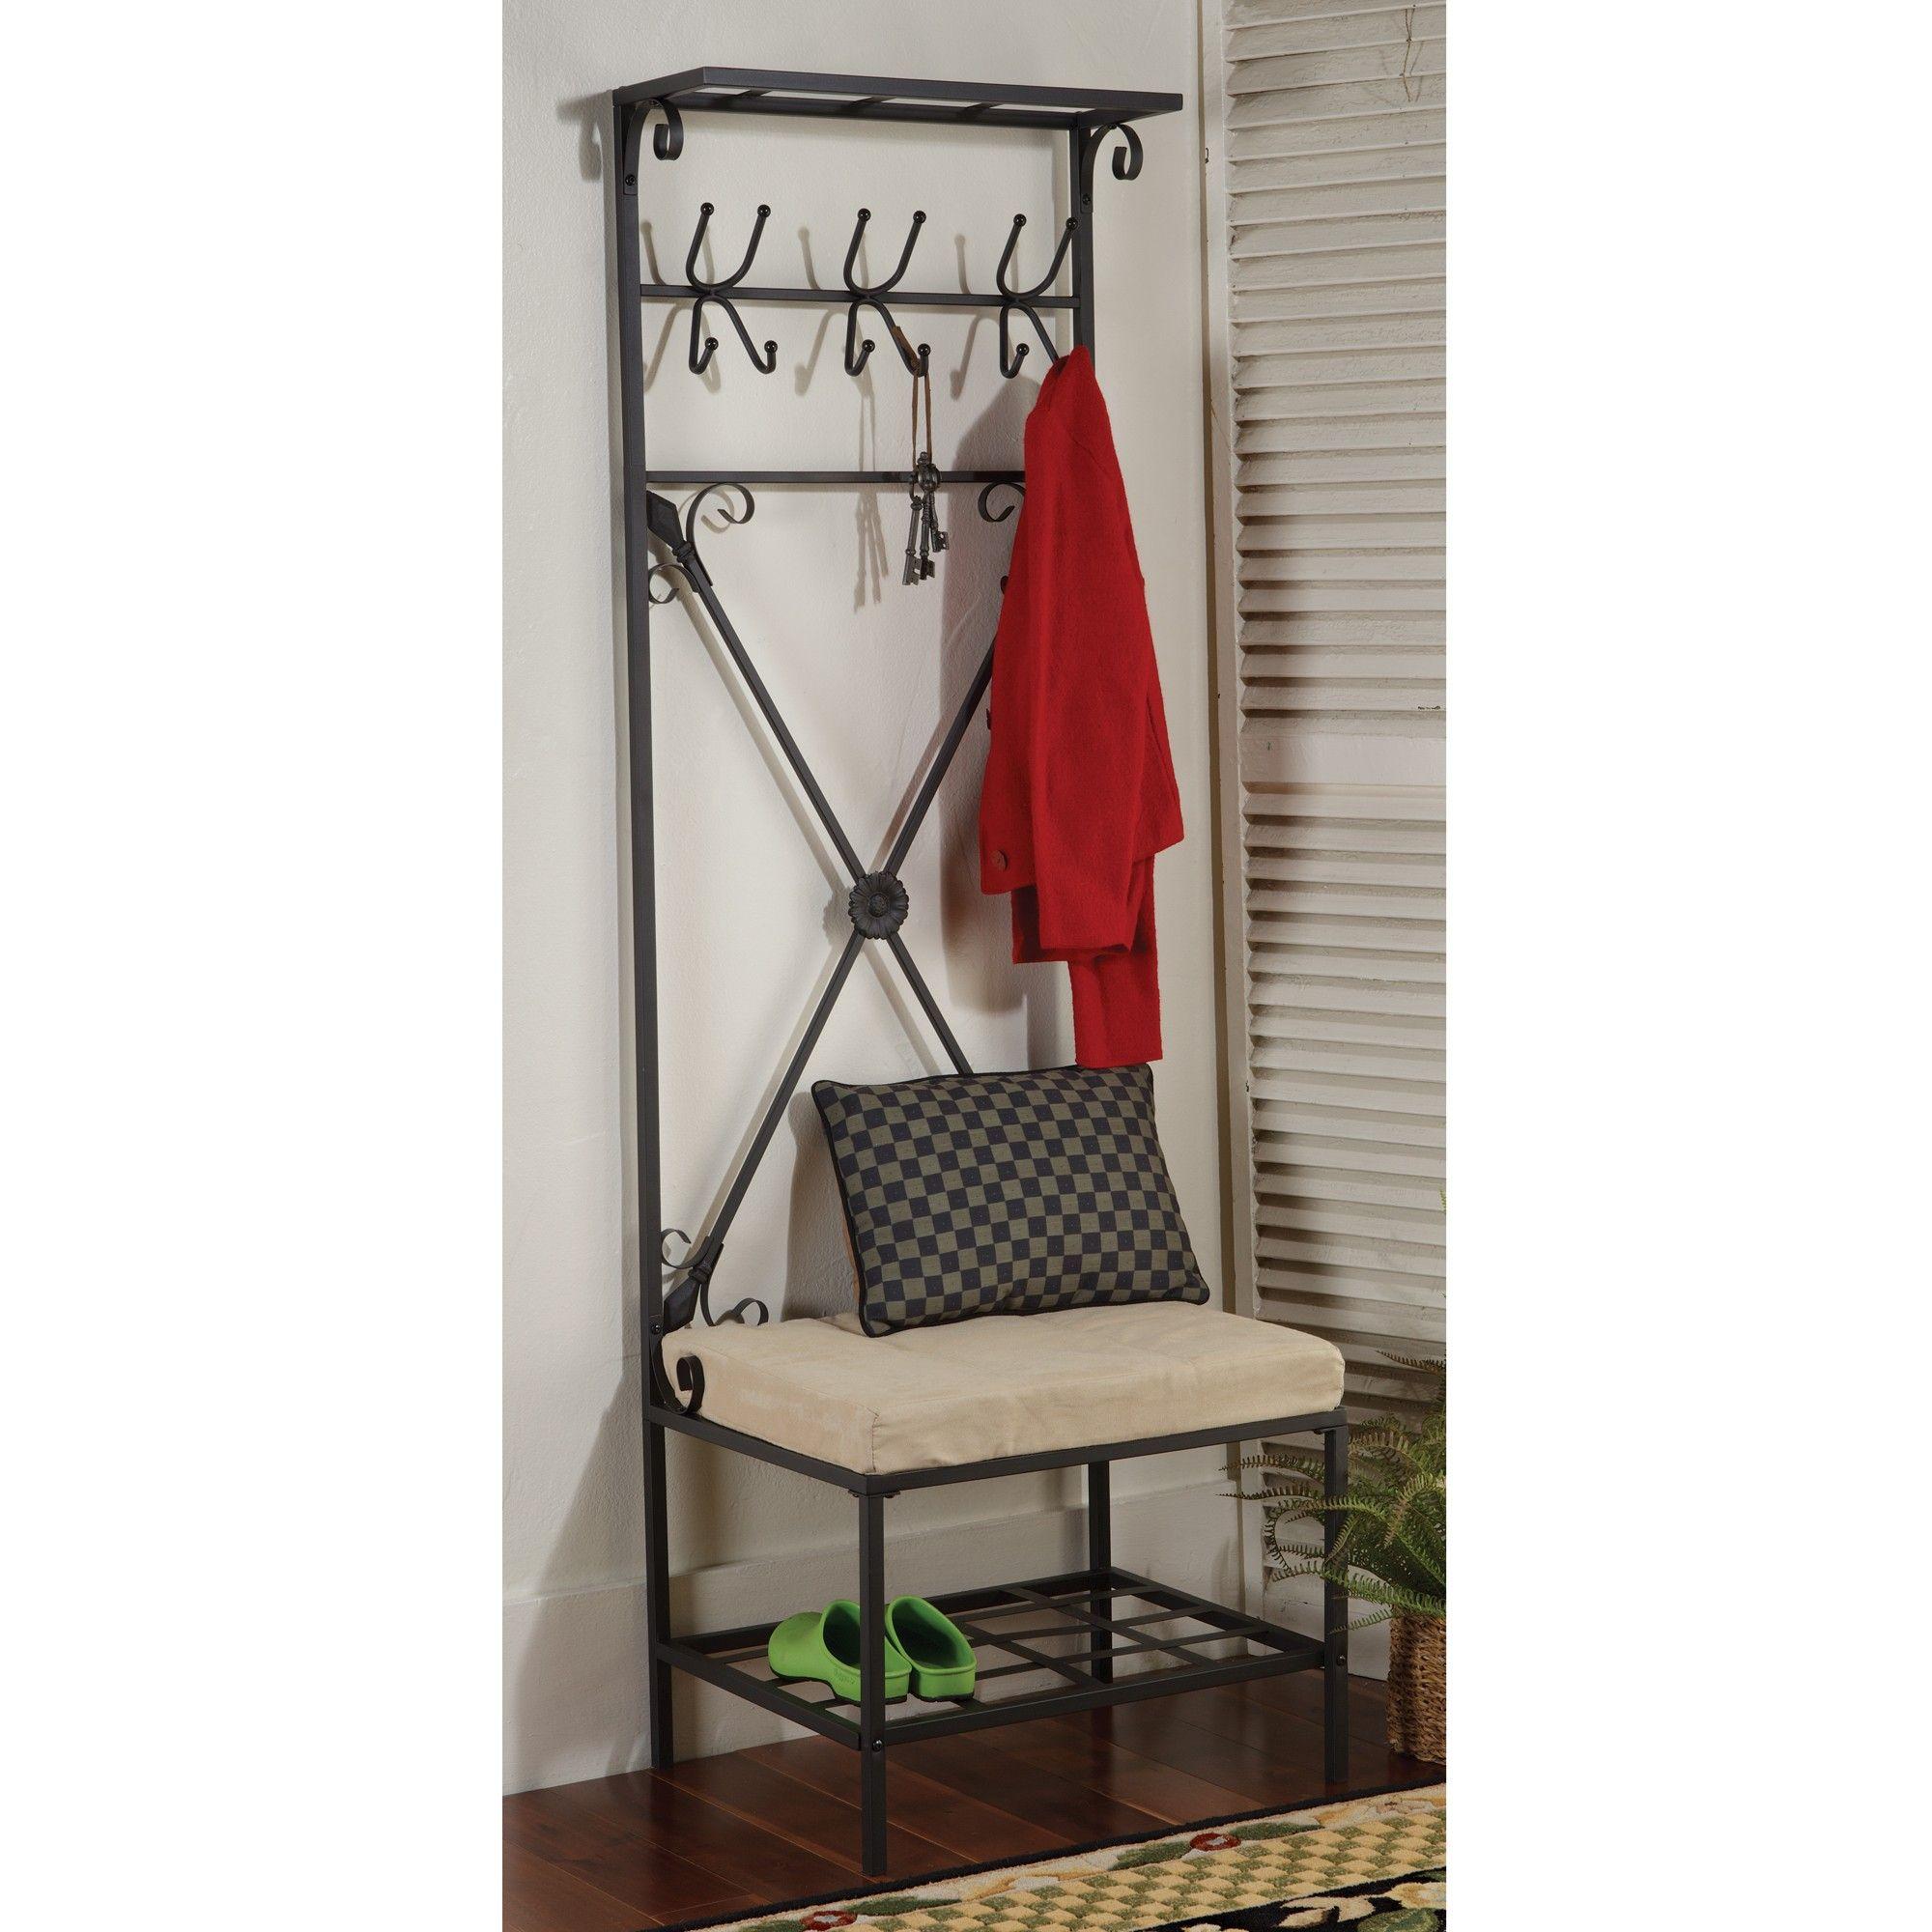 Hallway storage rack  shelf designs  Google Search  wardrobescabinetsclosets